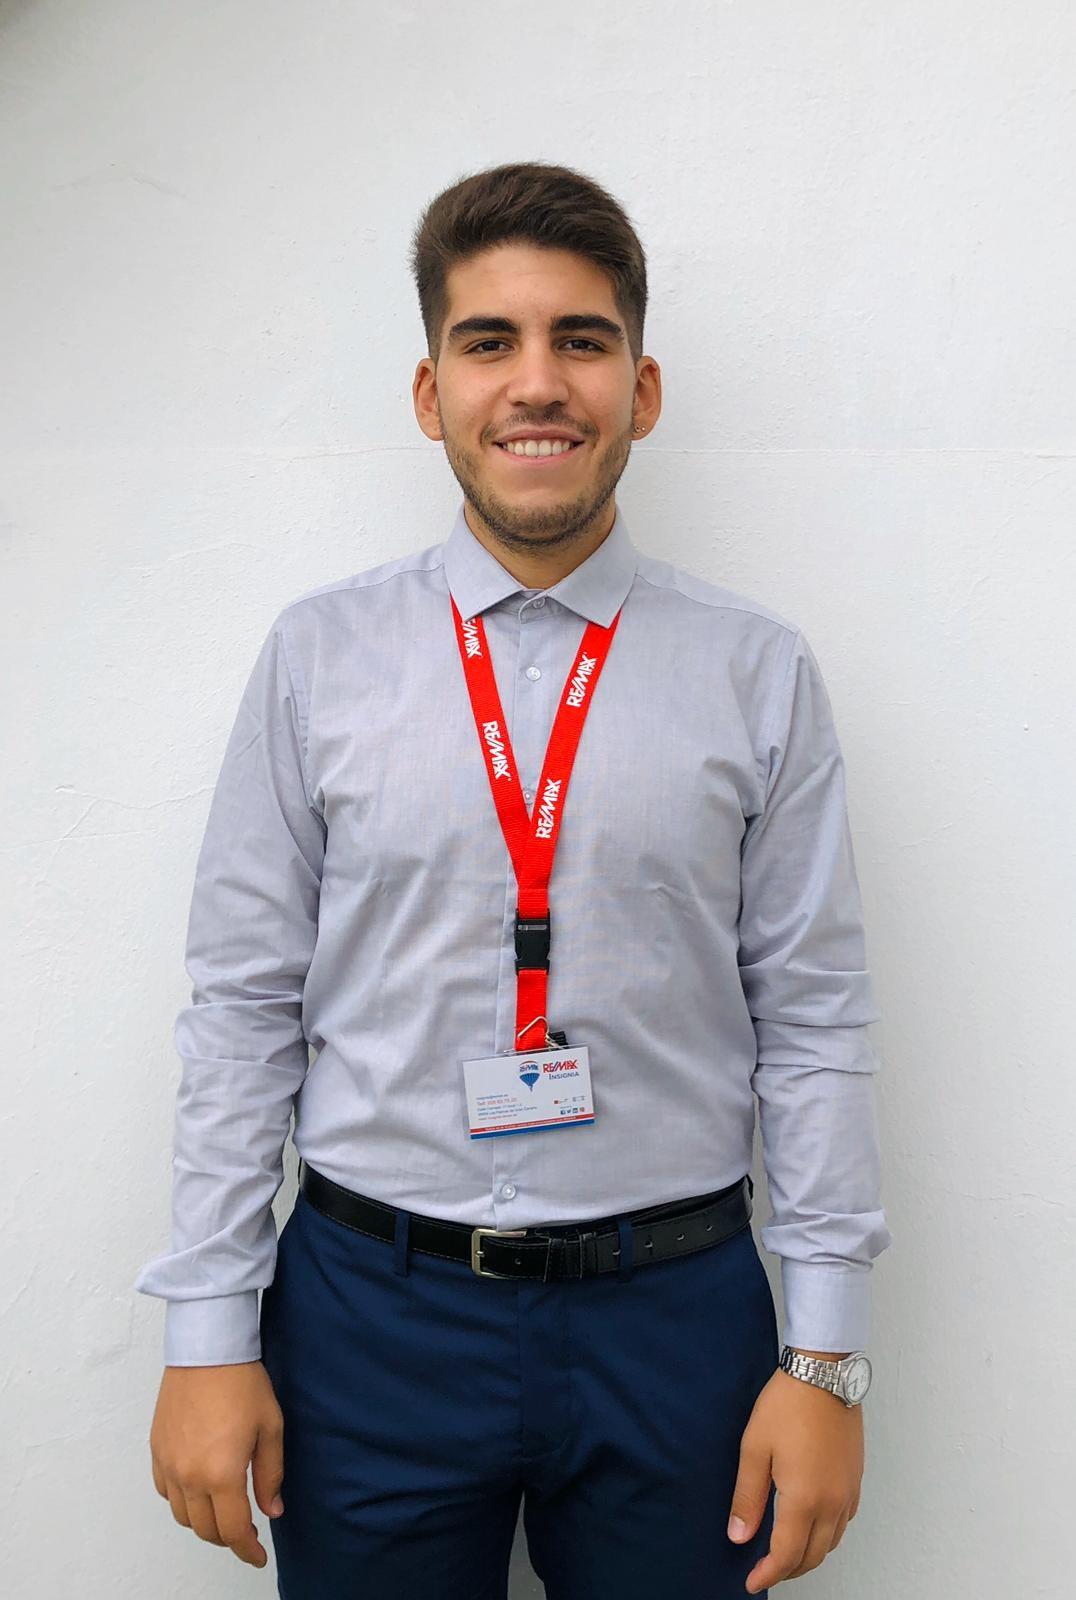 Juan Carlos Medina Garcia